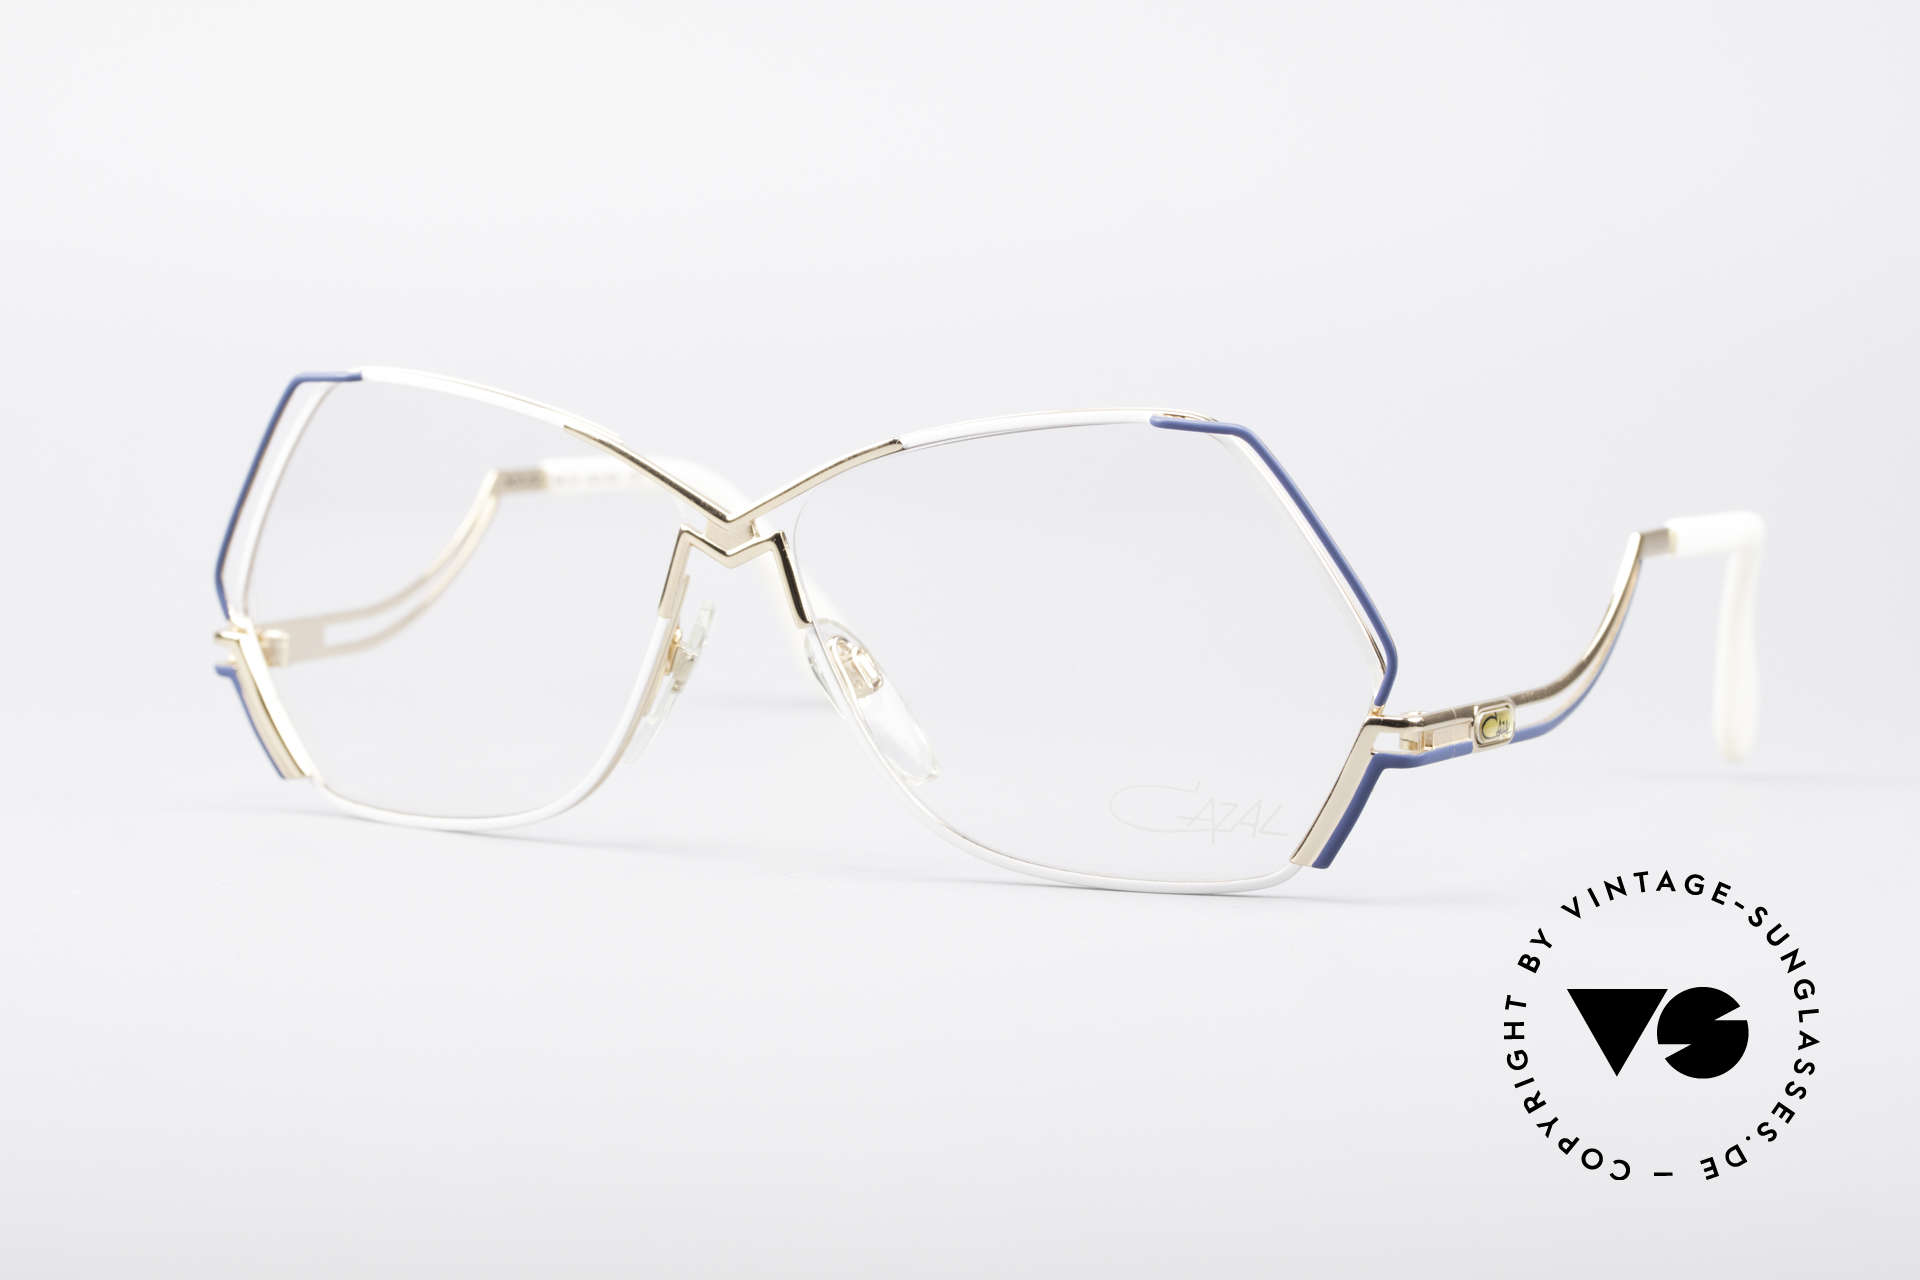 Cazal 226 West Germany Vintage Glasses, extraordinary CAZAL eyeglasses with pentagonal lens, Made for Women